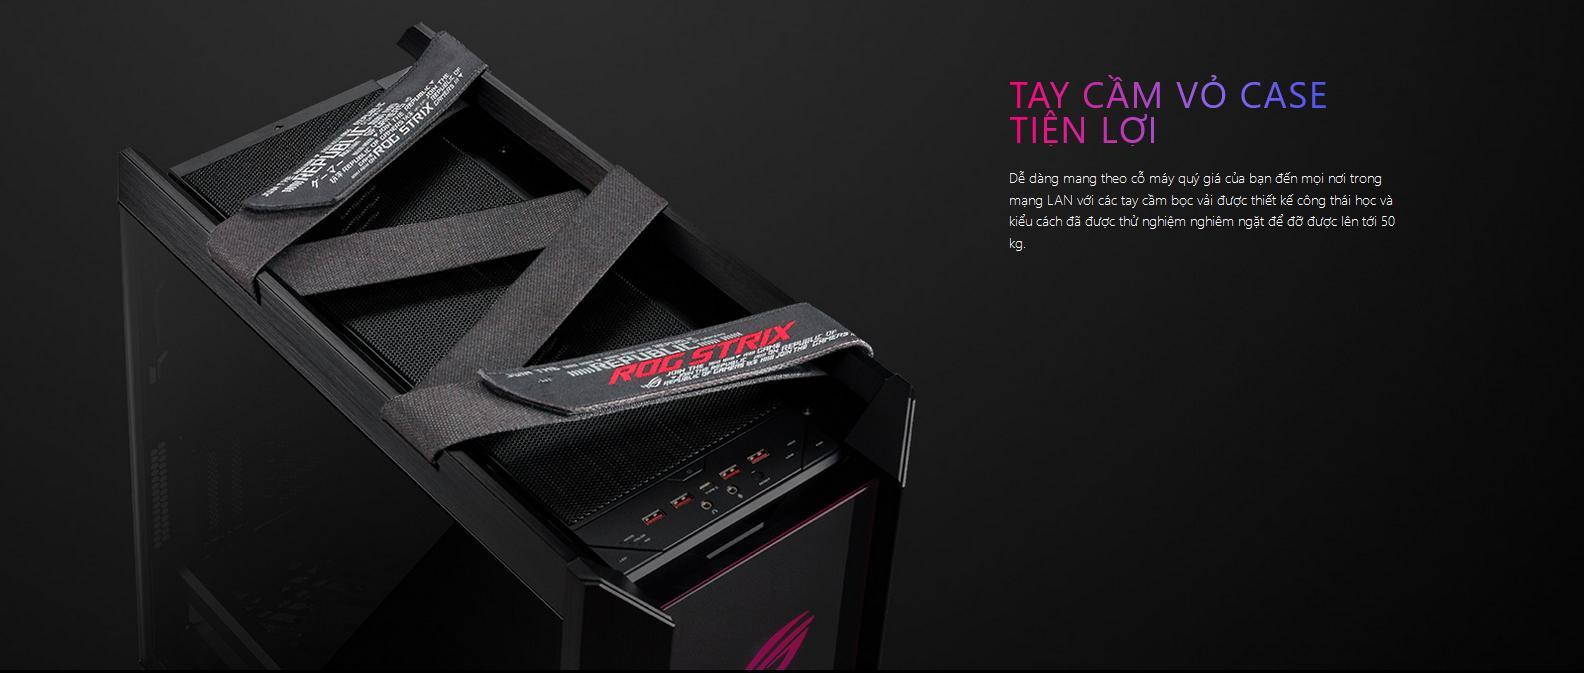 Vỏ Case Asus ROG Strix Helios GX601 Tempered Glass Gaminggiới thiệu 8